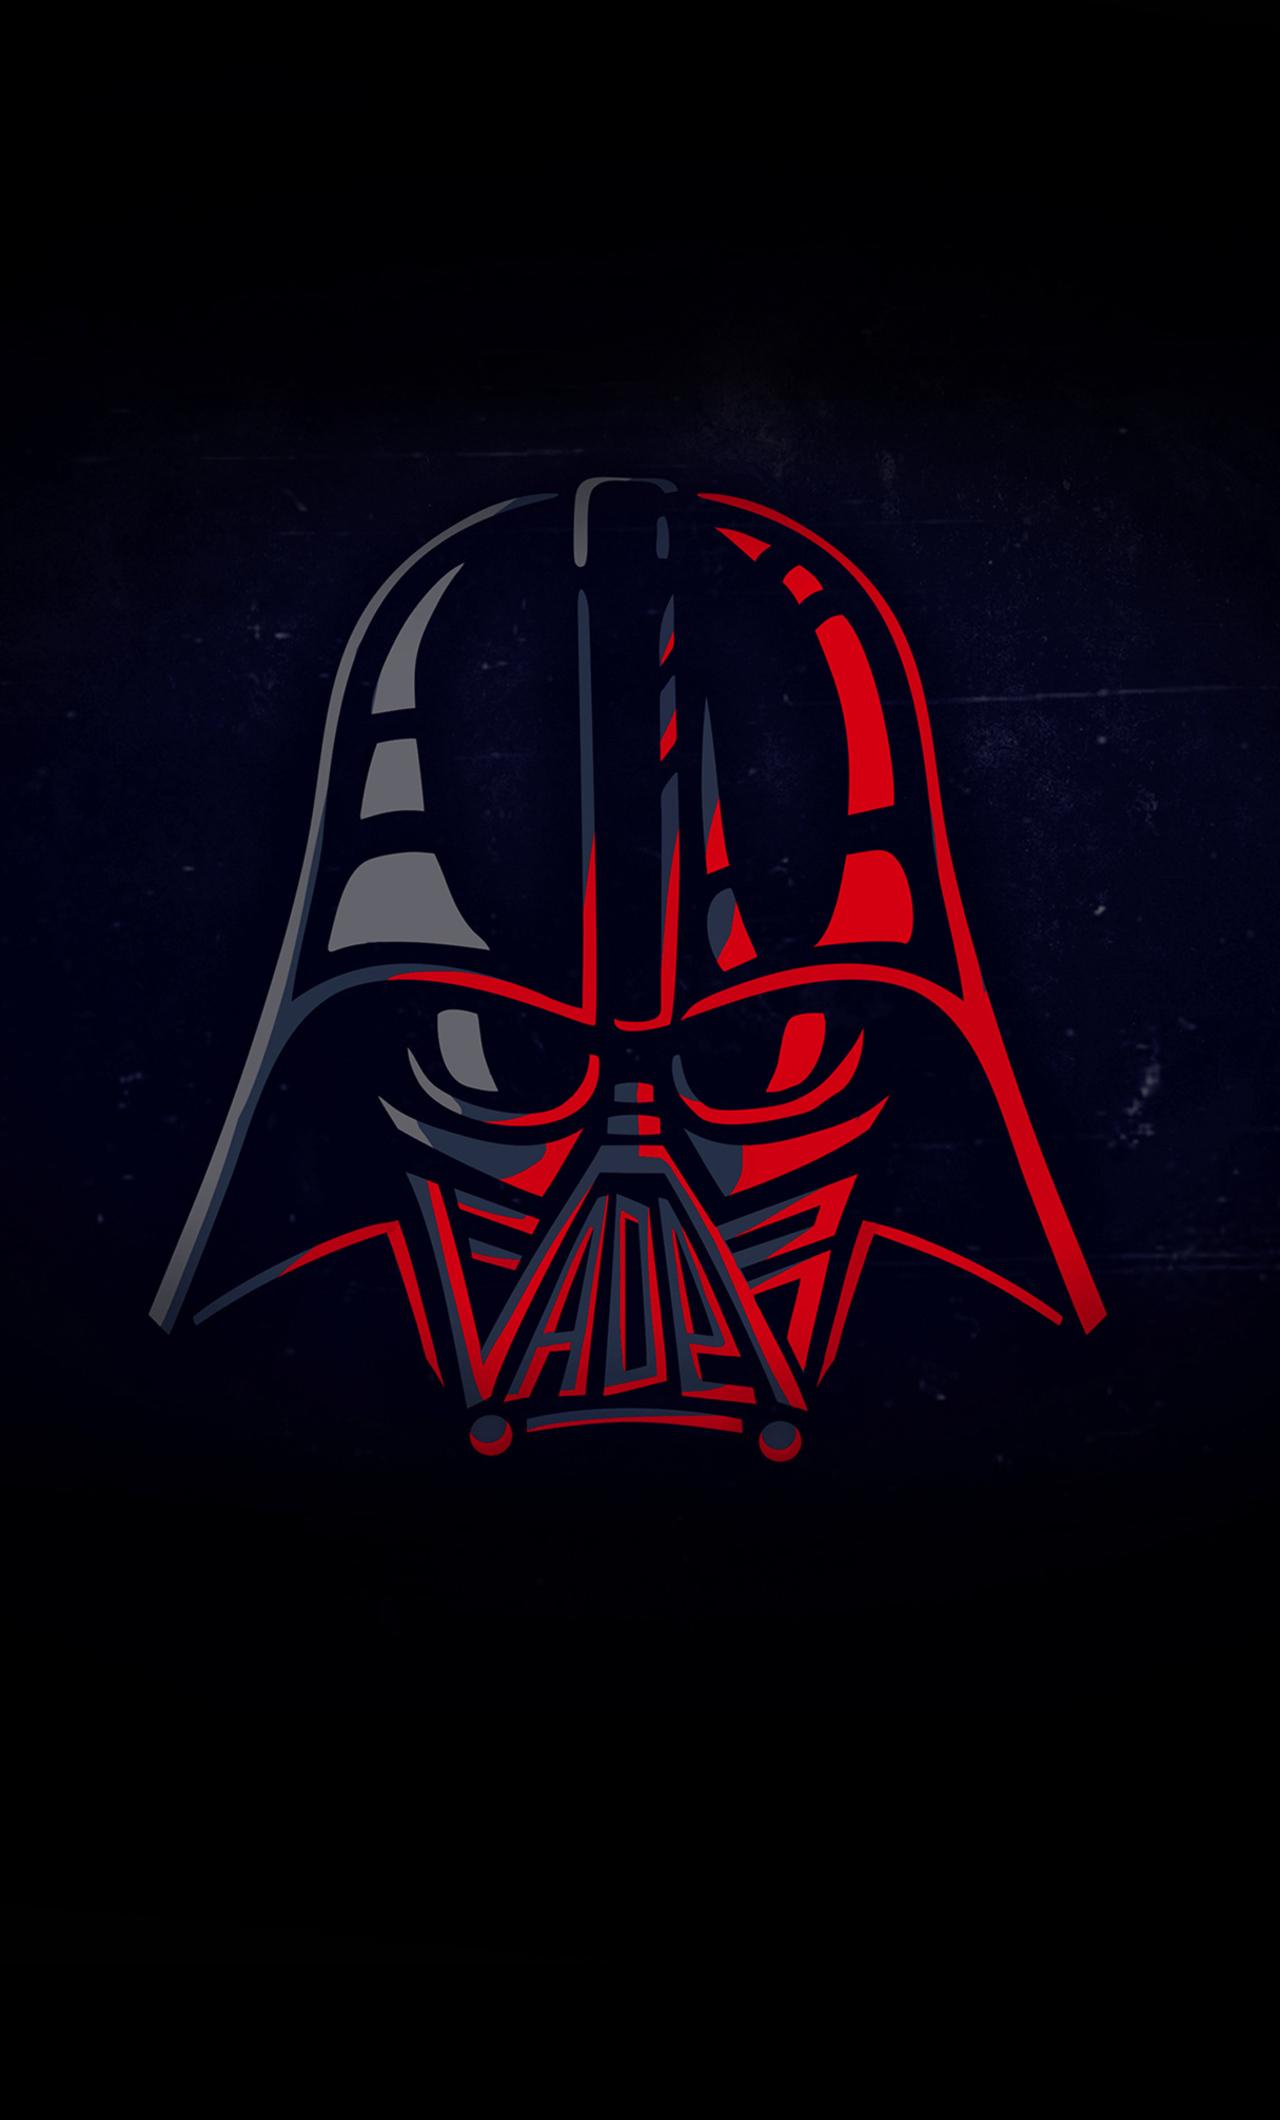 1280x2120 Darth Vader Minimal 4k Iphone 6 Hd 4k Wallpapers